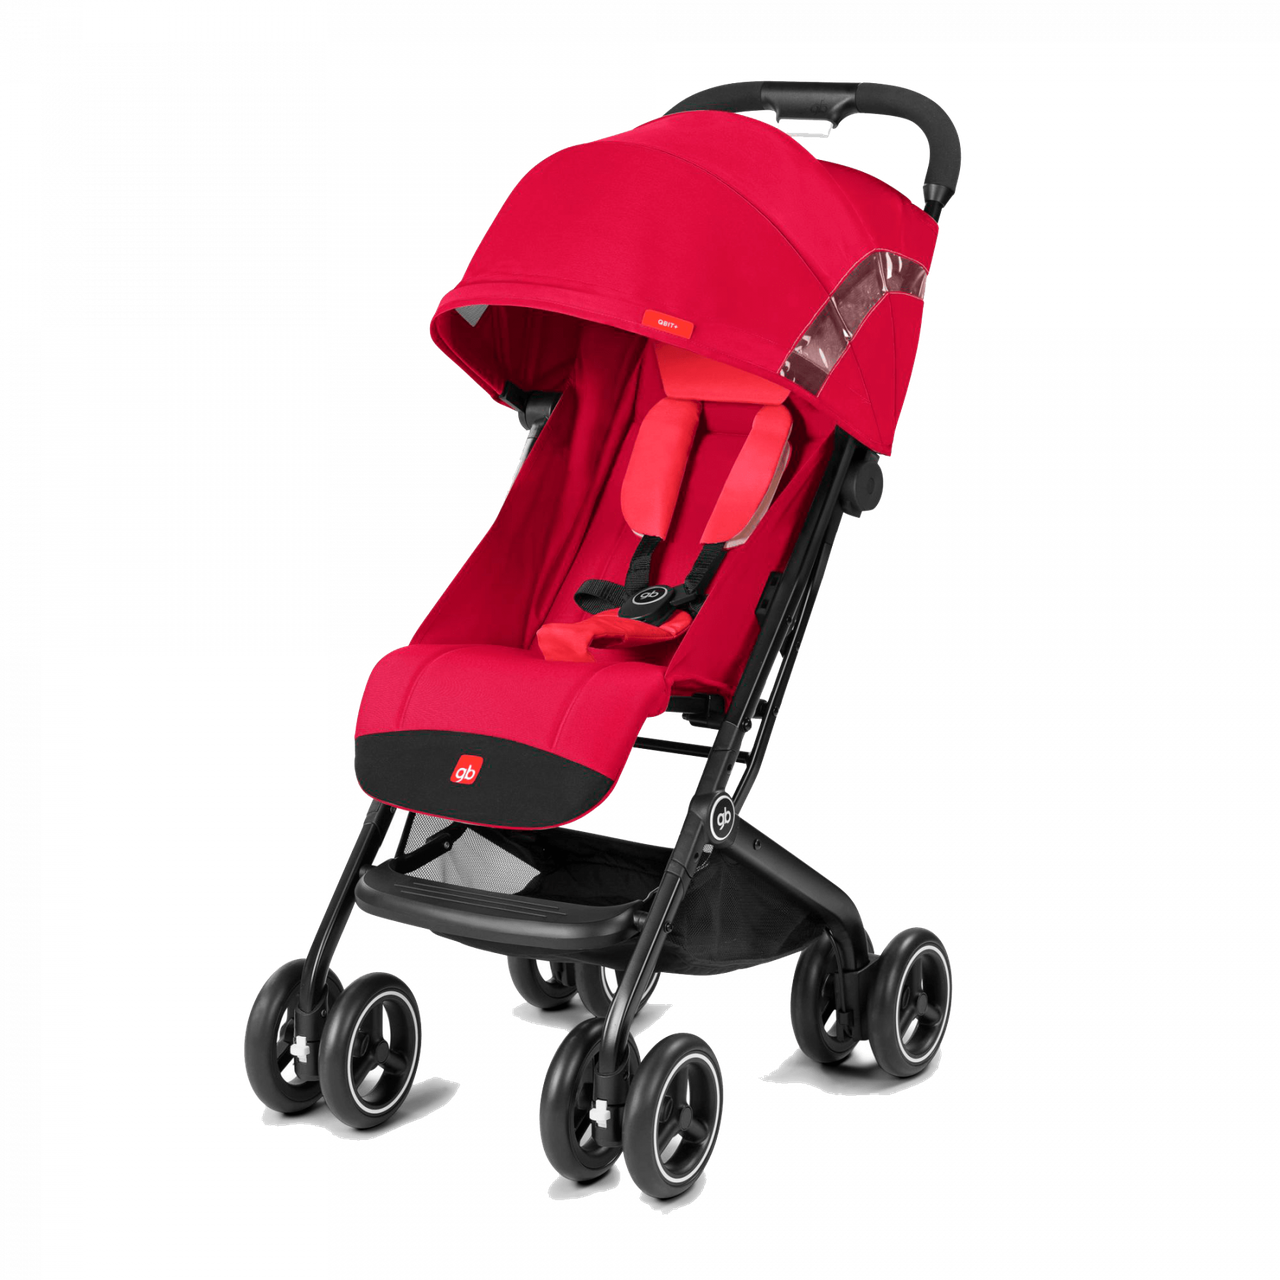 GB - Прогулочная коляска Qbit+ All-Terrain, Rose Red (2019 год)